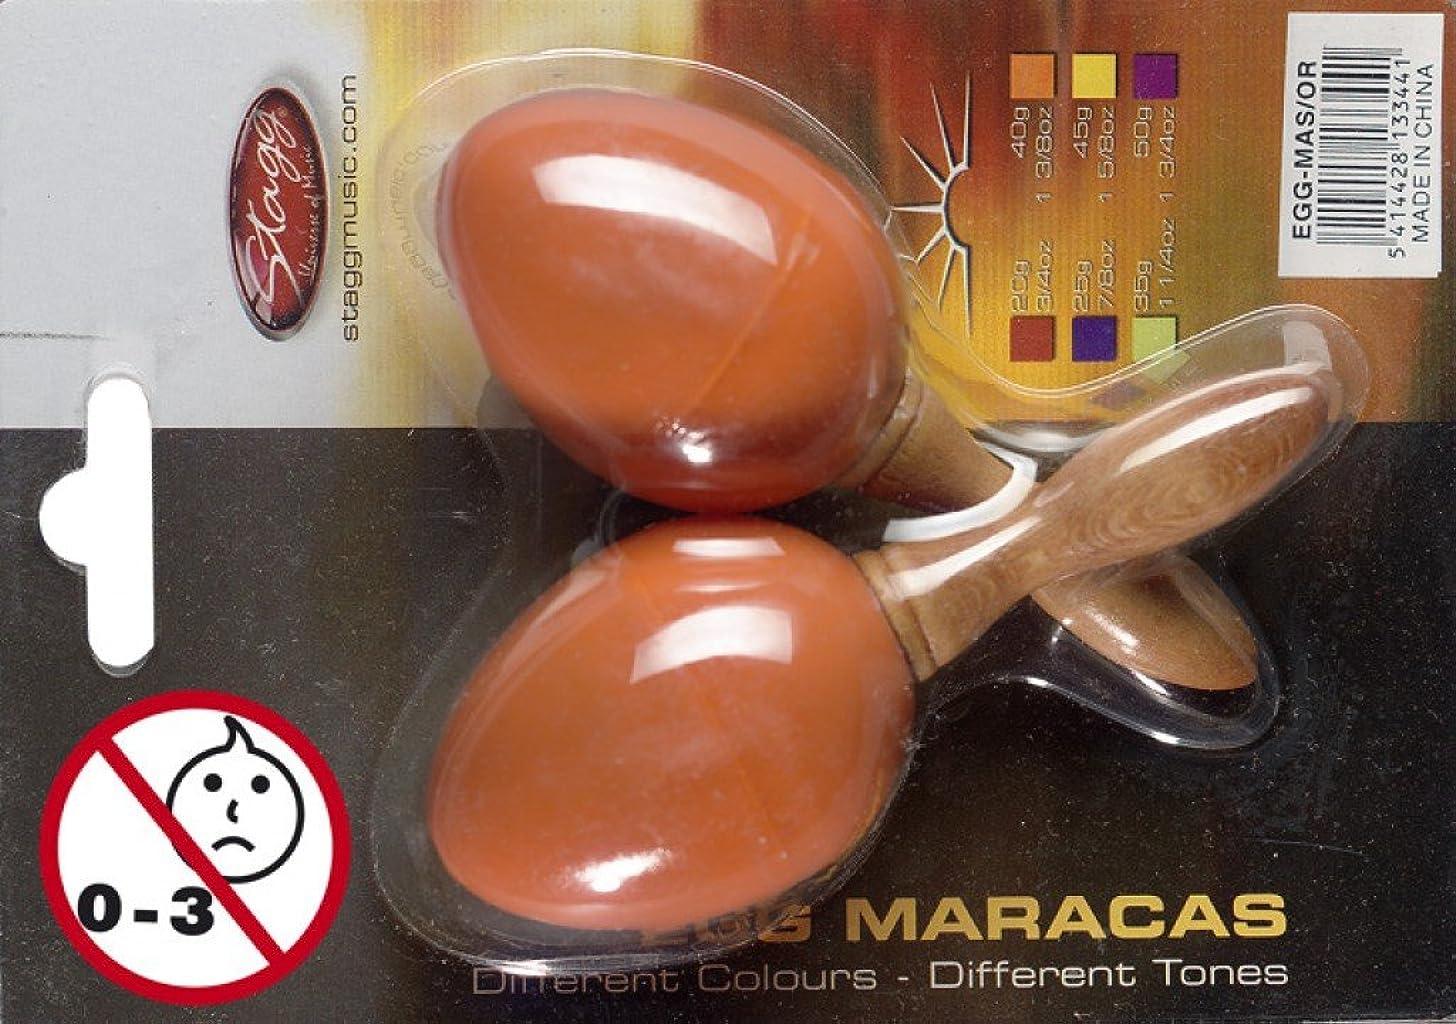 Stagg EGG-MA Plastic Egg Maracas Pair with Long Handle - Orange